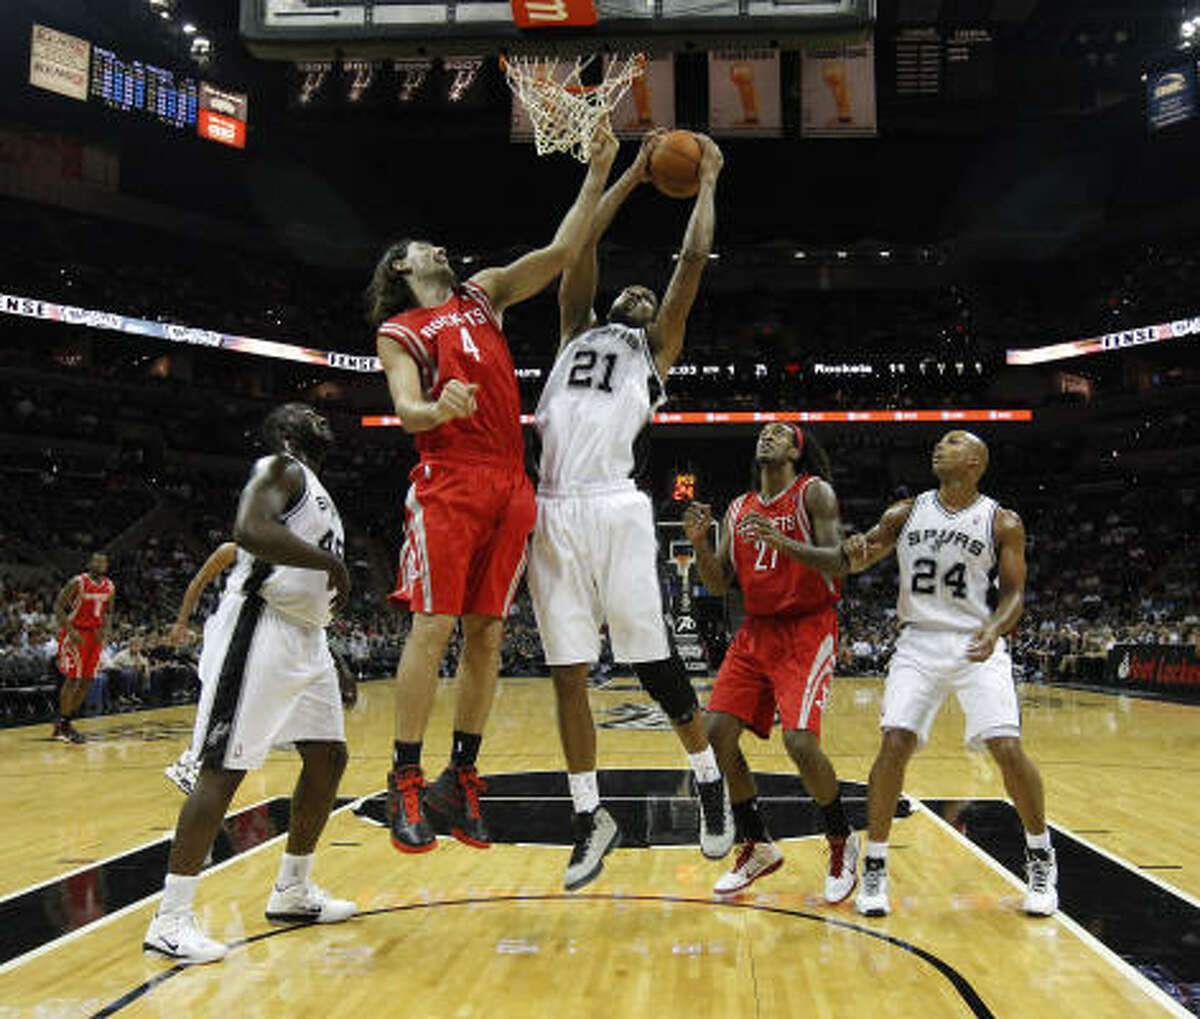 Spurs forward Tim Duncan pulls down a rebound in front of Rockets forward Luis Scola.